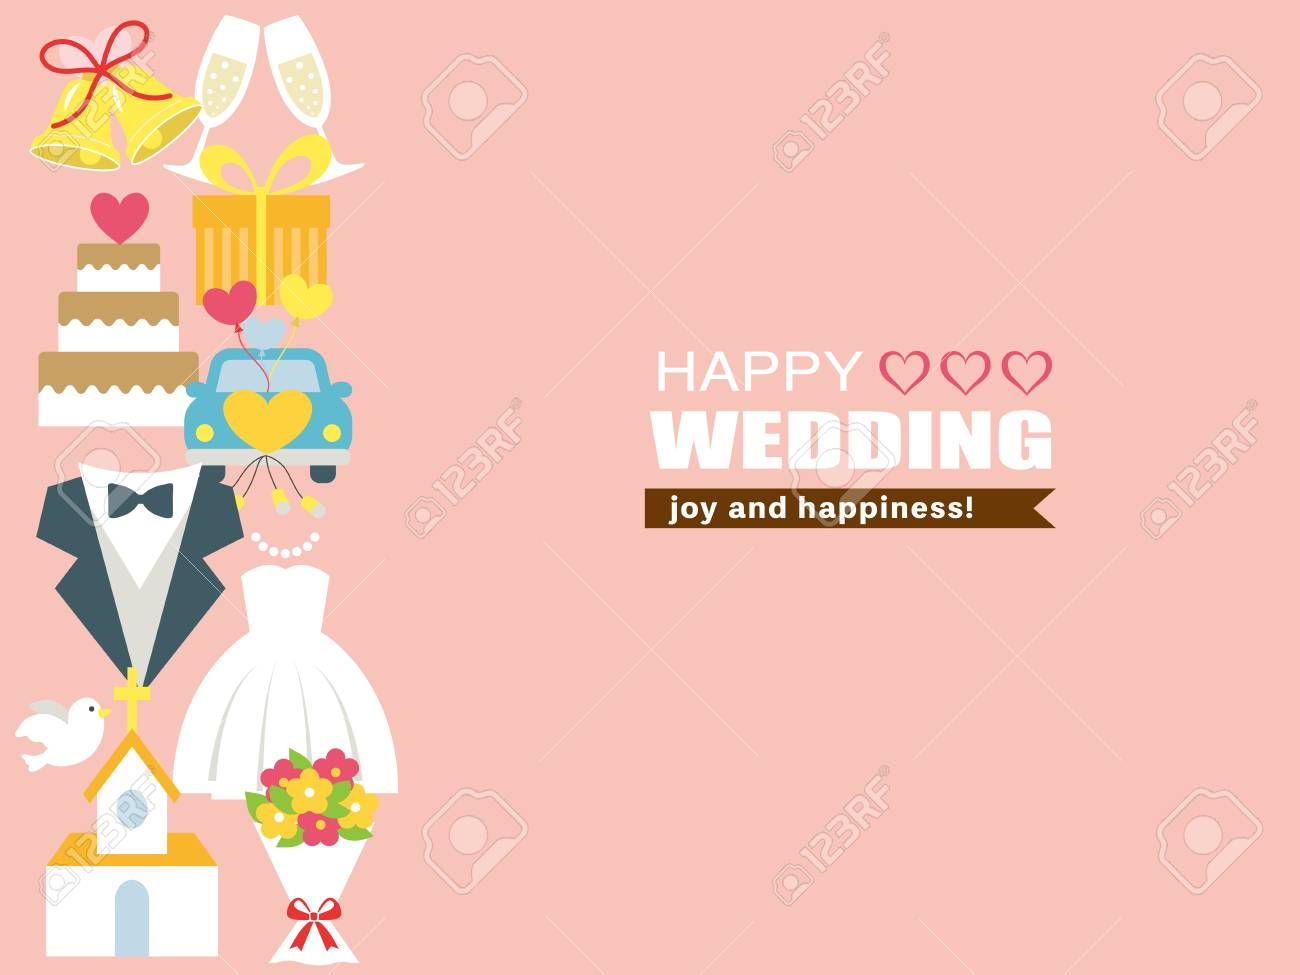 Happy Wedding Greeting Card Royalty Free Cliparts Vectors And